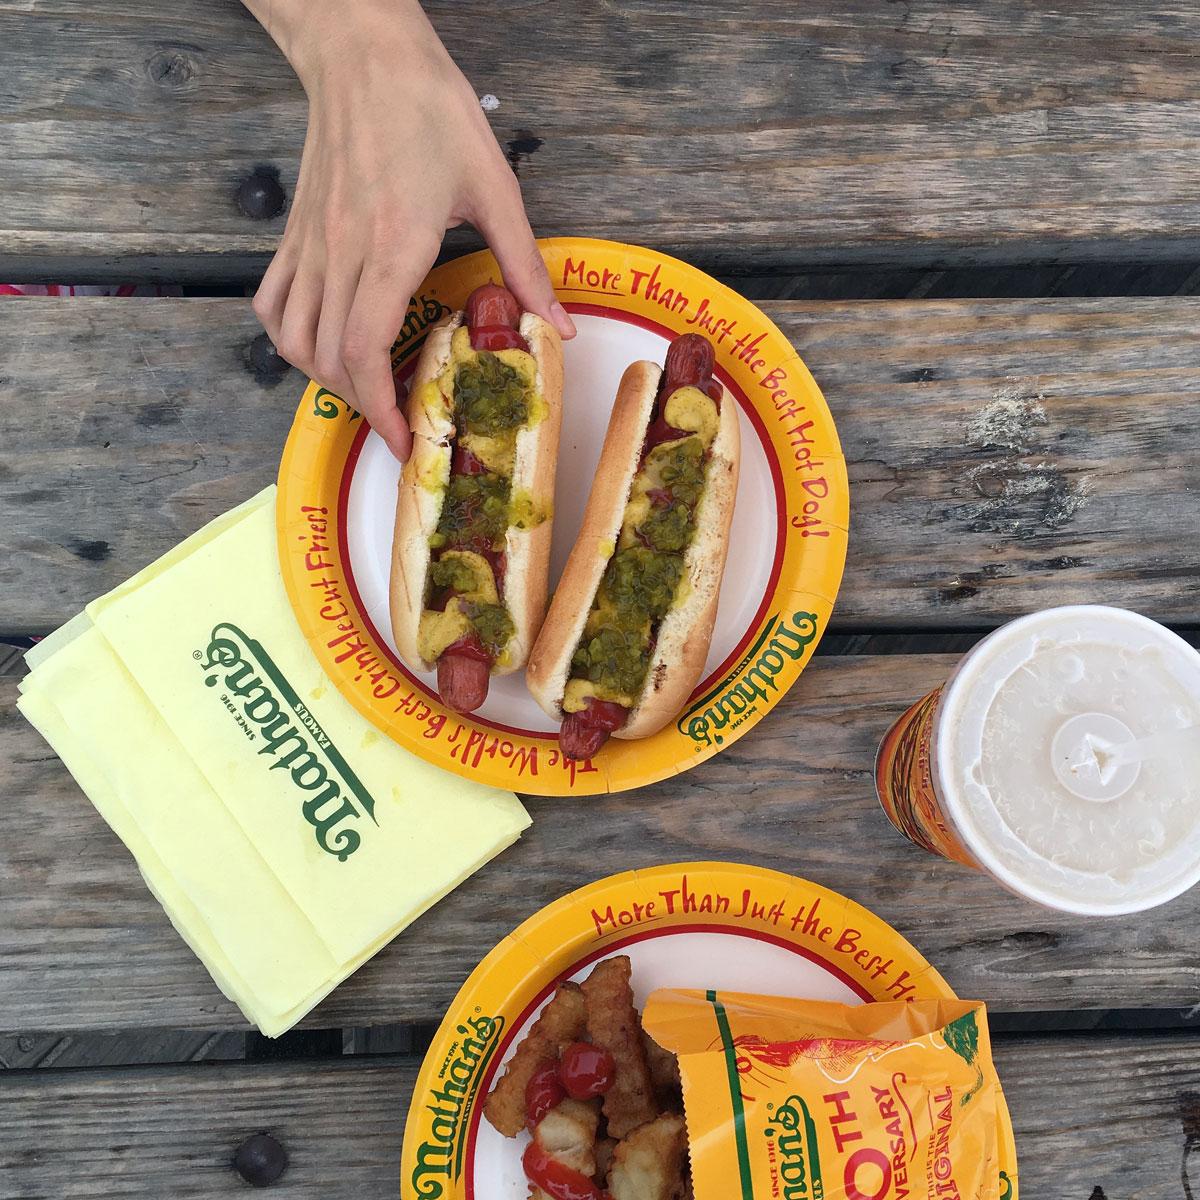 Nathans-hot-dogs.jpg